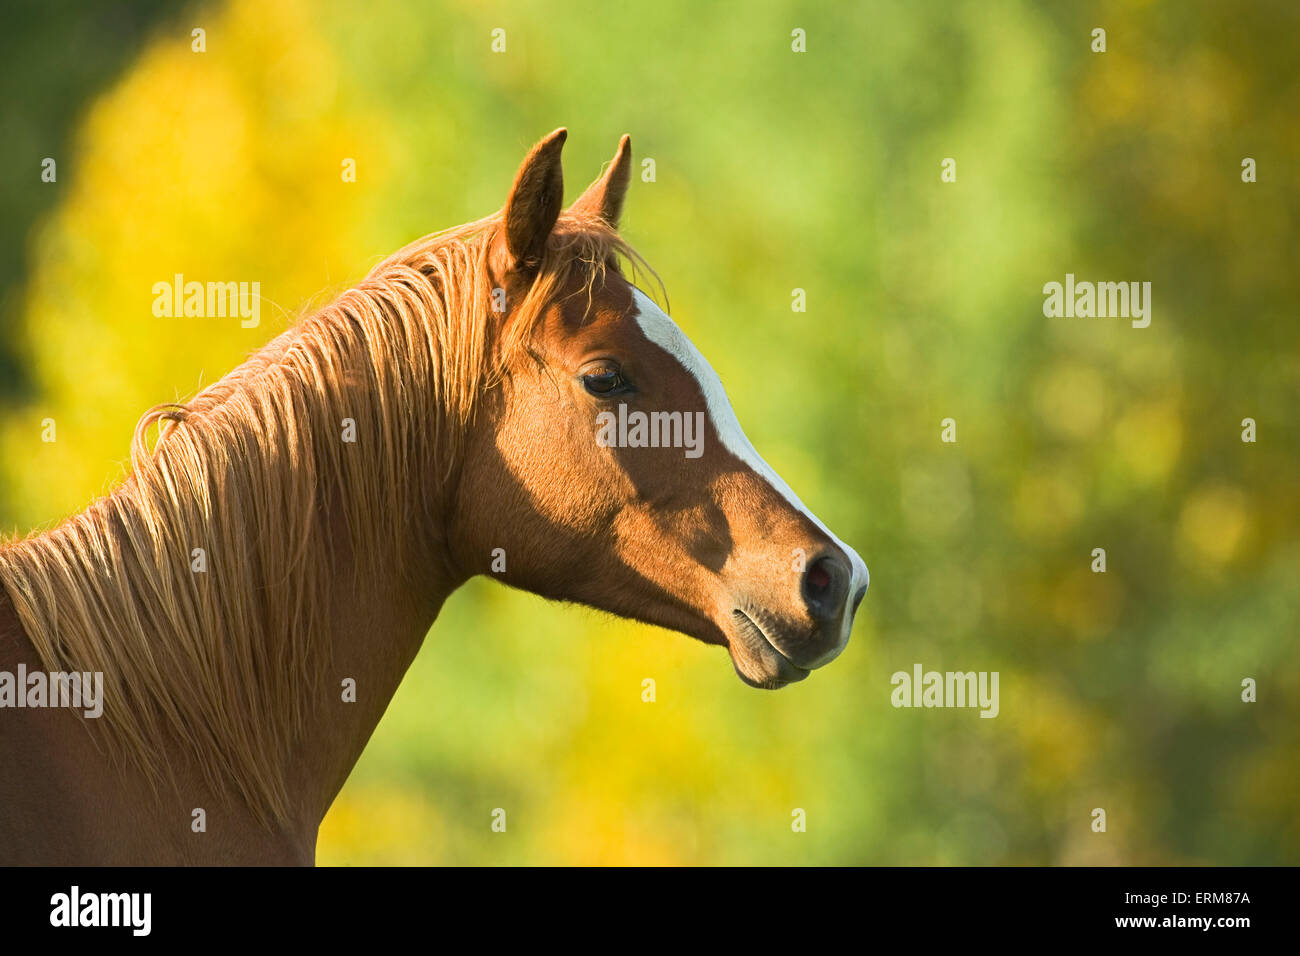 Chestnut Arabian Horse portrait closeup - Stock Image